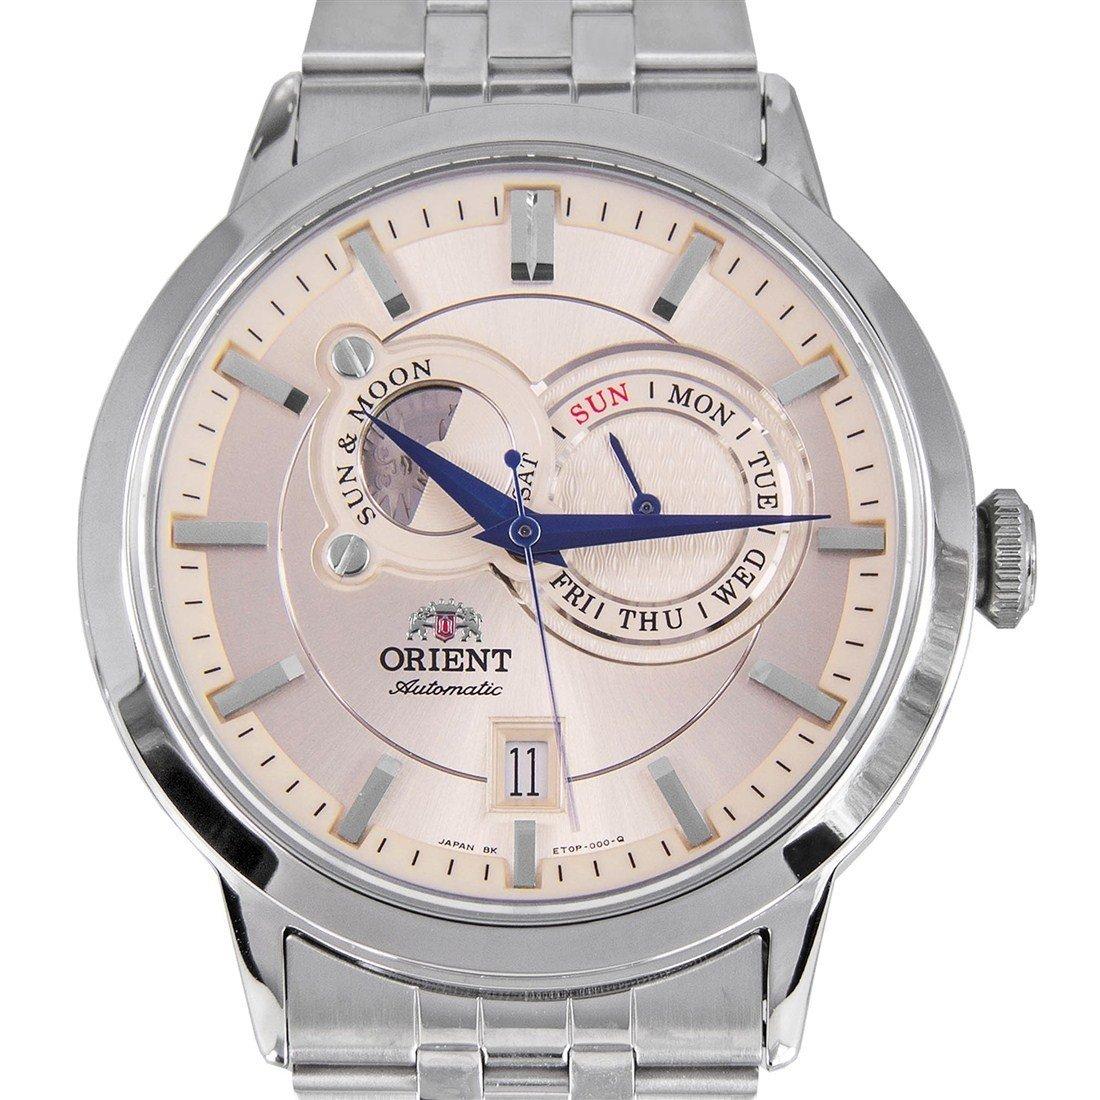 reloj hombre automático Orient Sun and Moon FET0P002W cristal zarifo acero